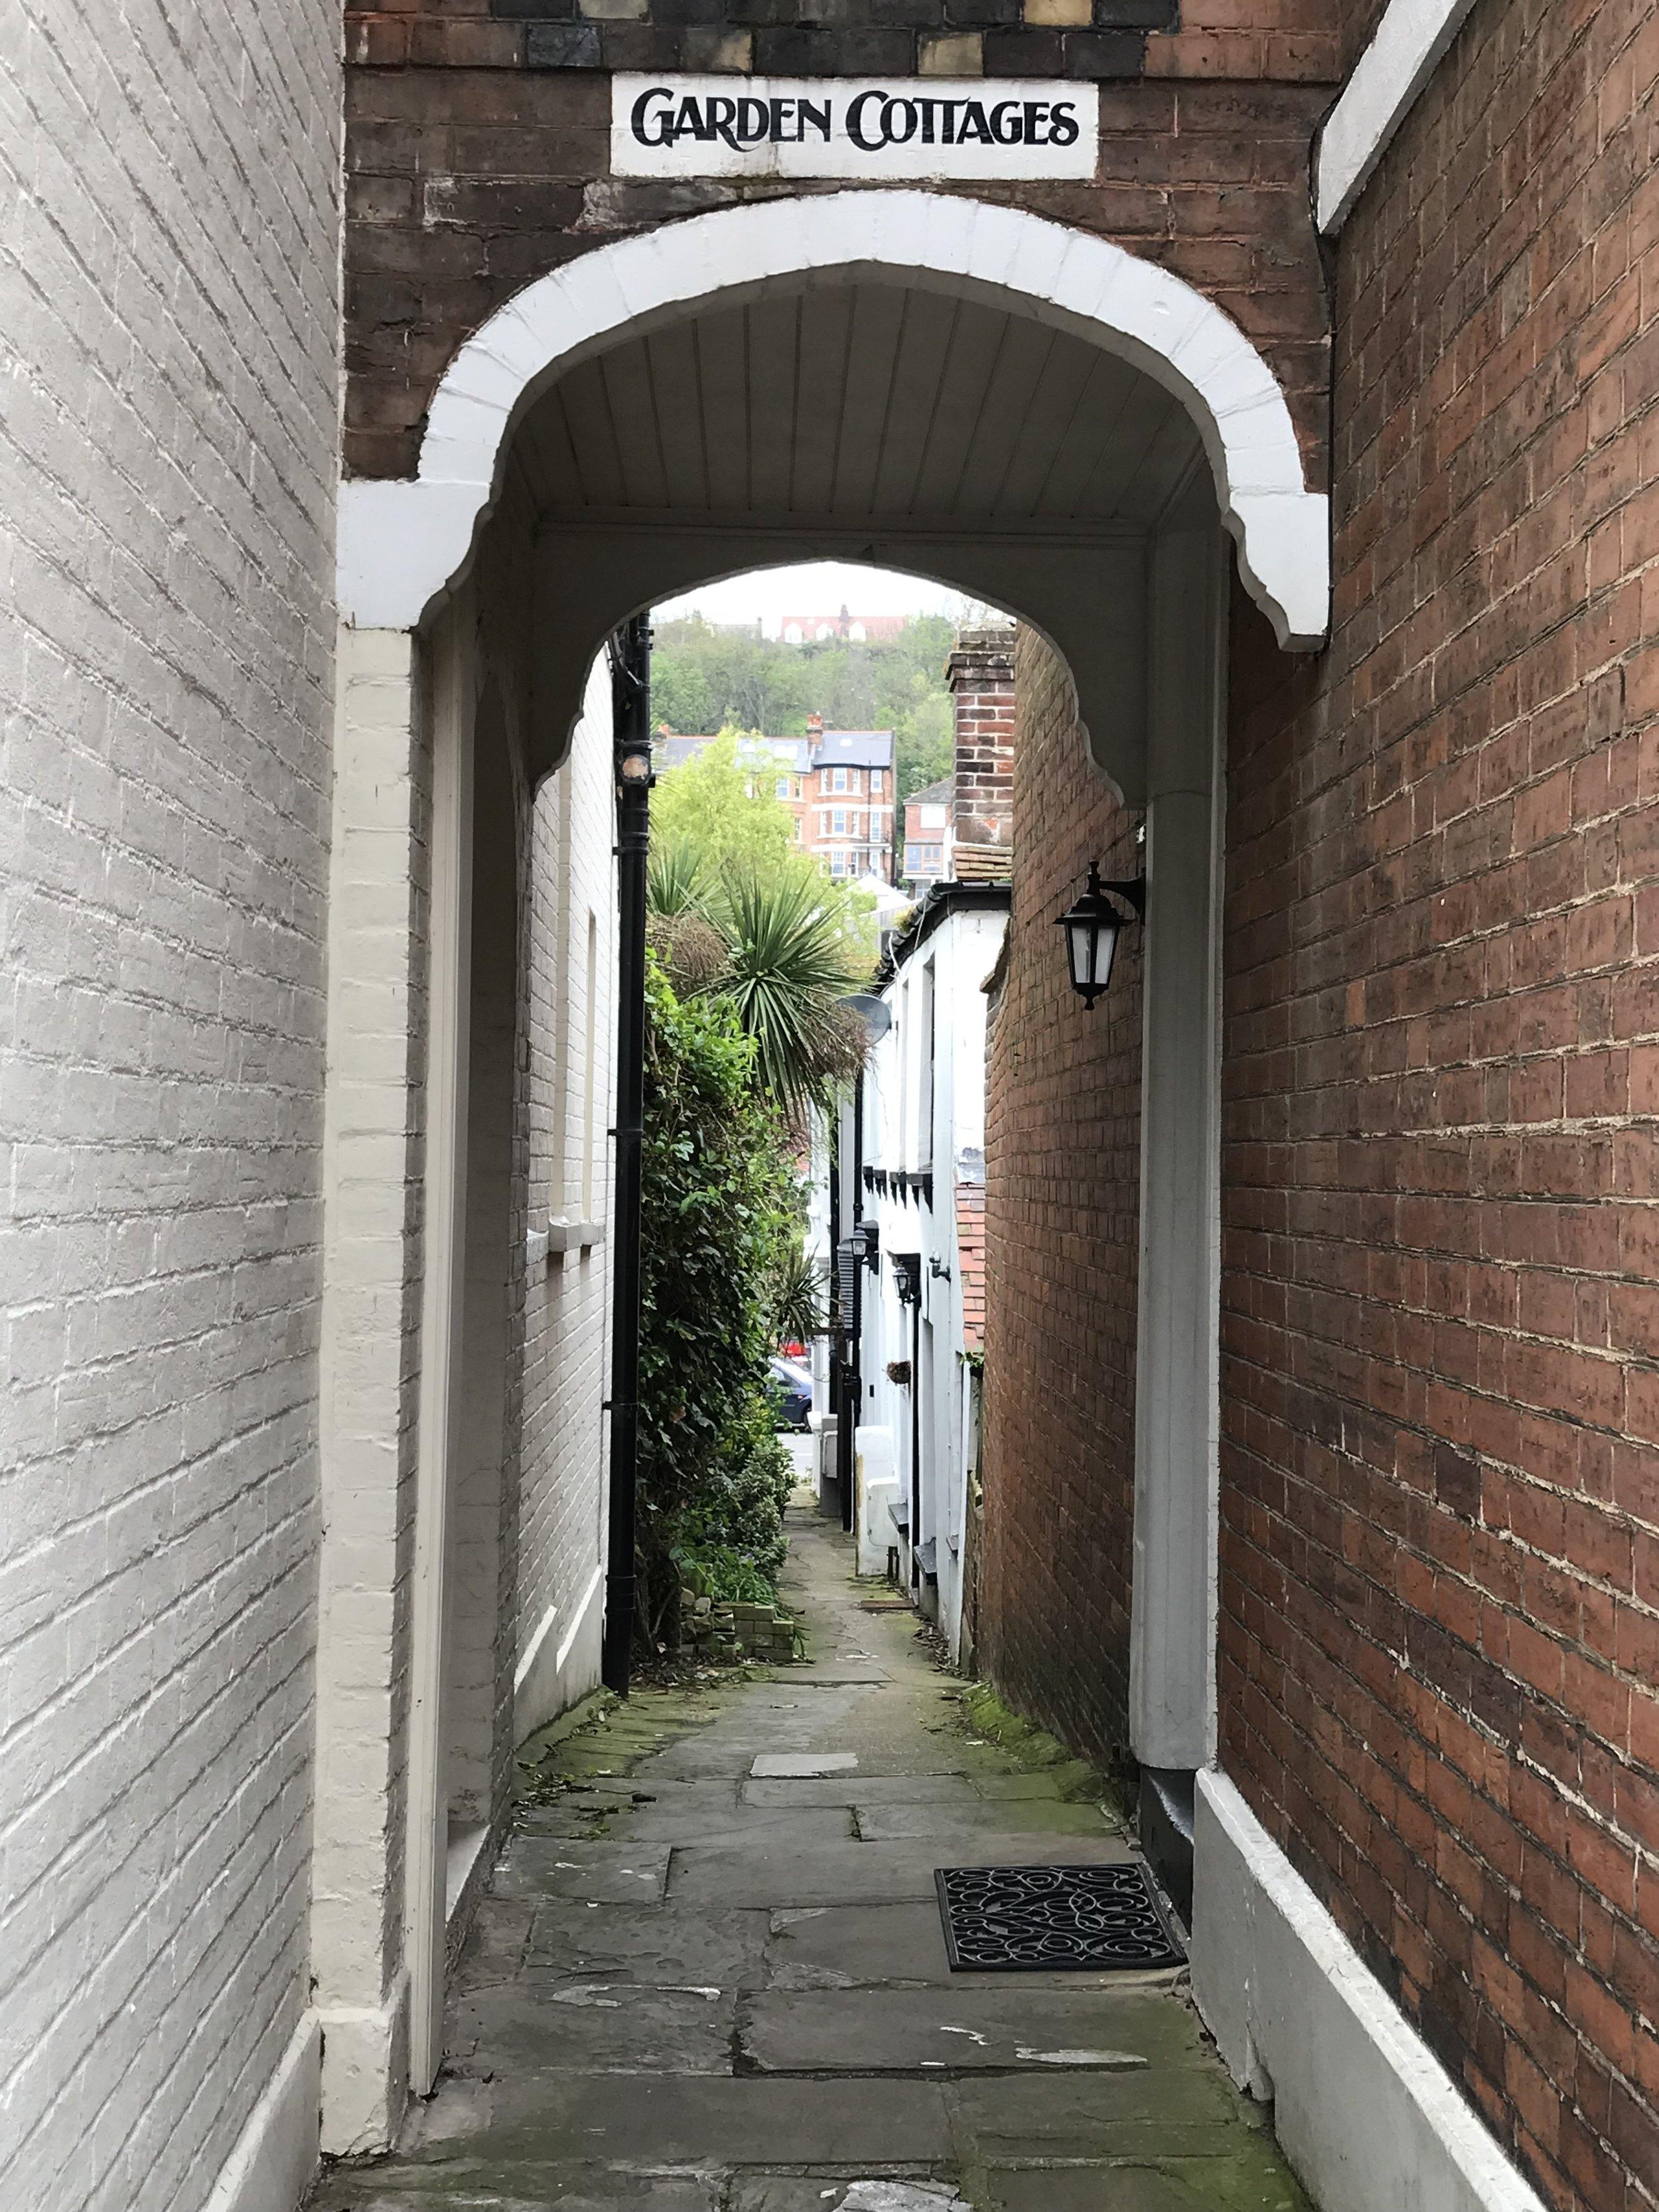 Quaint little alleyways